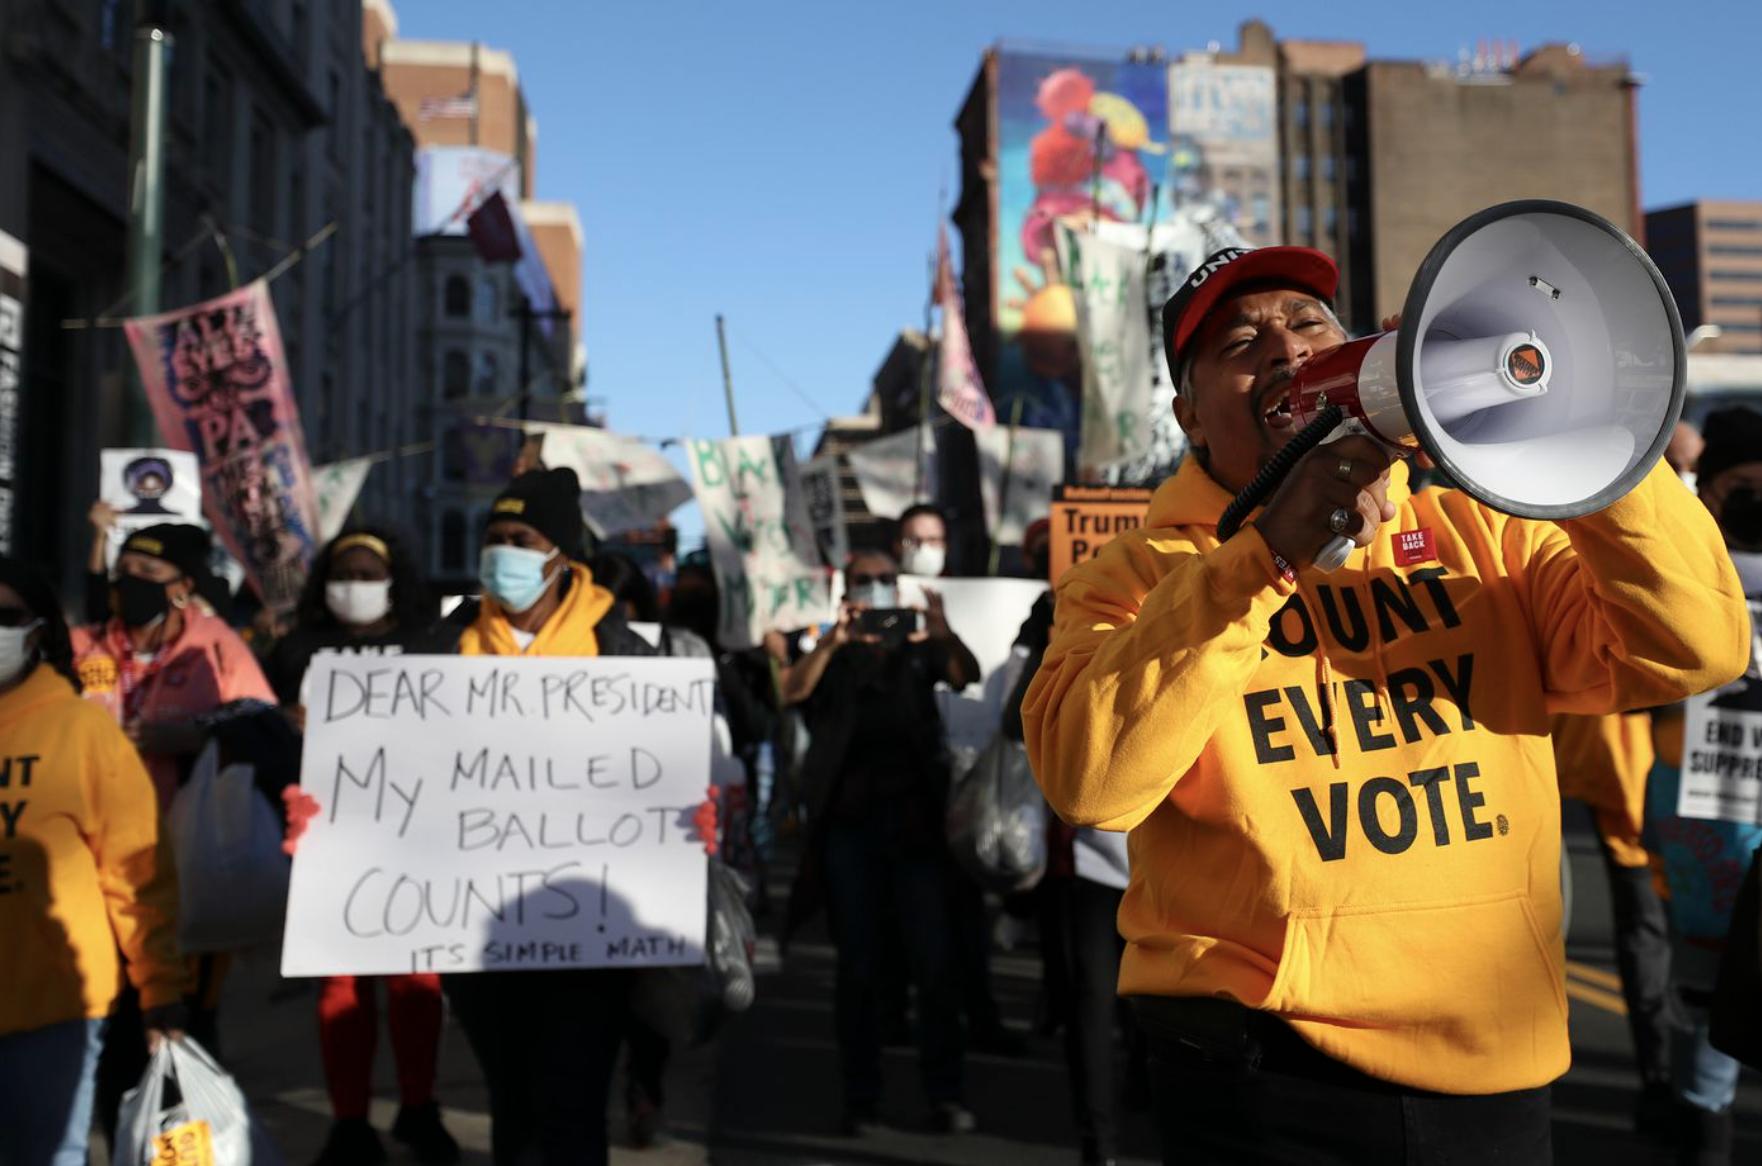 Count Every Vote CREDIT: Heather Khalifa/Philadelphia Inquirer